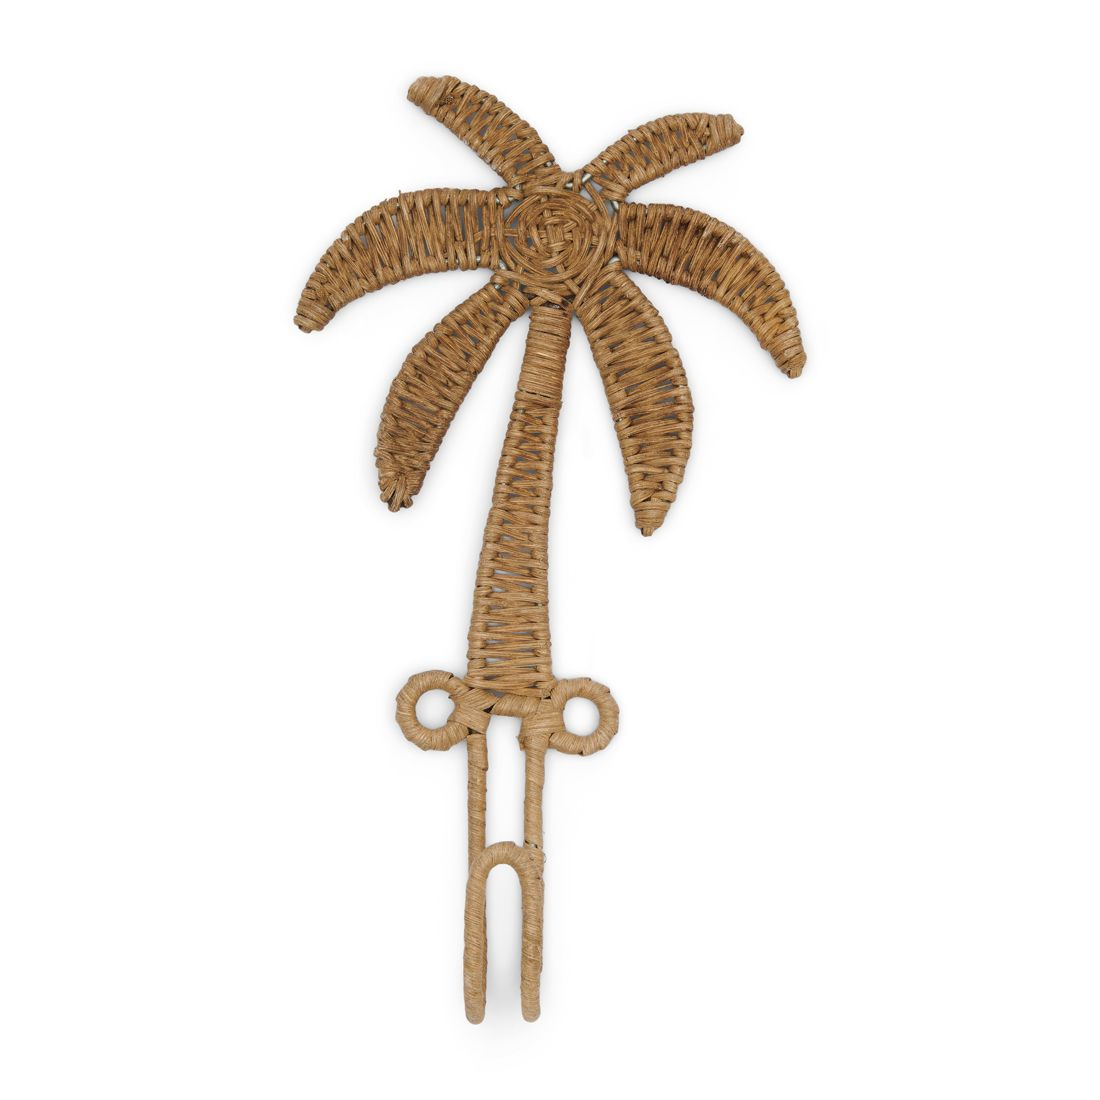 Rüstig Rattan Tropical Palm Haken